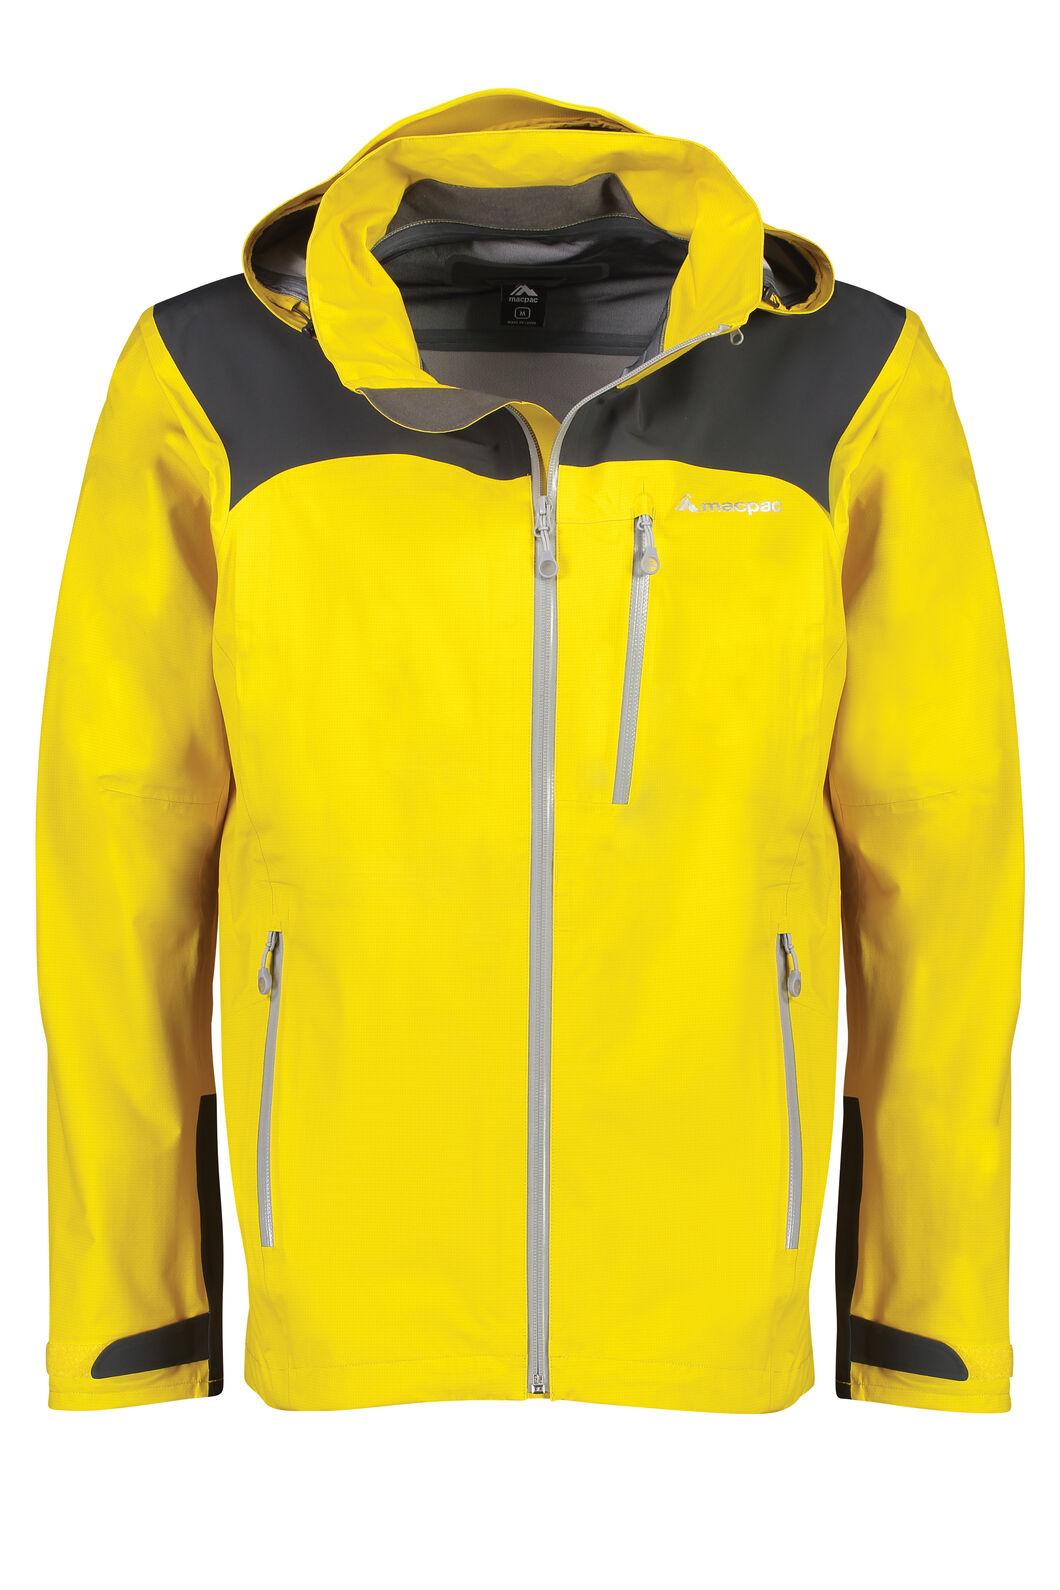 Macpac Traverse Pertex®Rain Jacket - Men's, Lemon Curry, hi-res